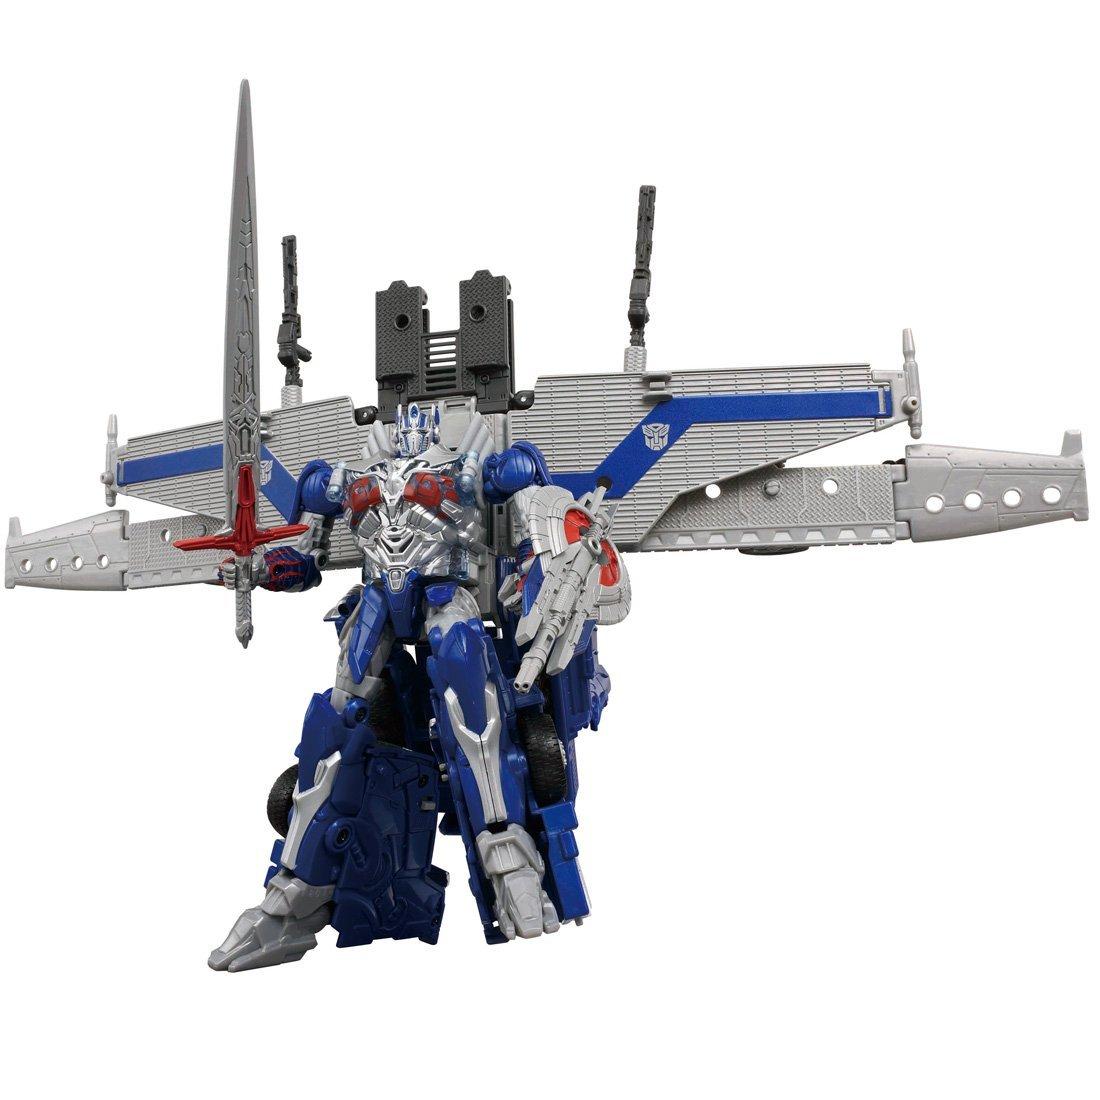 Takara Tomy Transformers Turbo Change TC-04 Big Grimlock Robot Toy Figure*